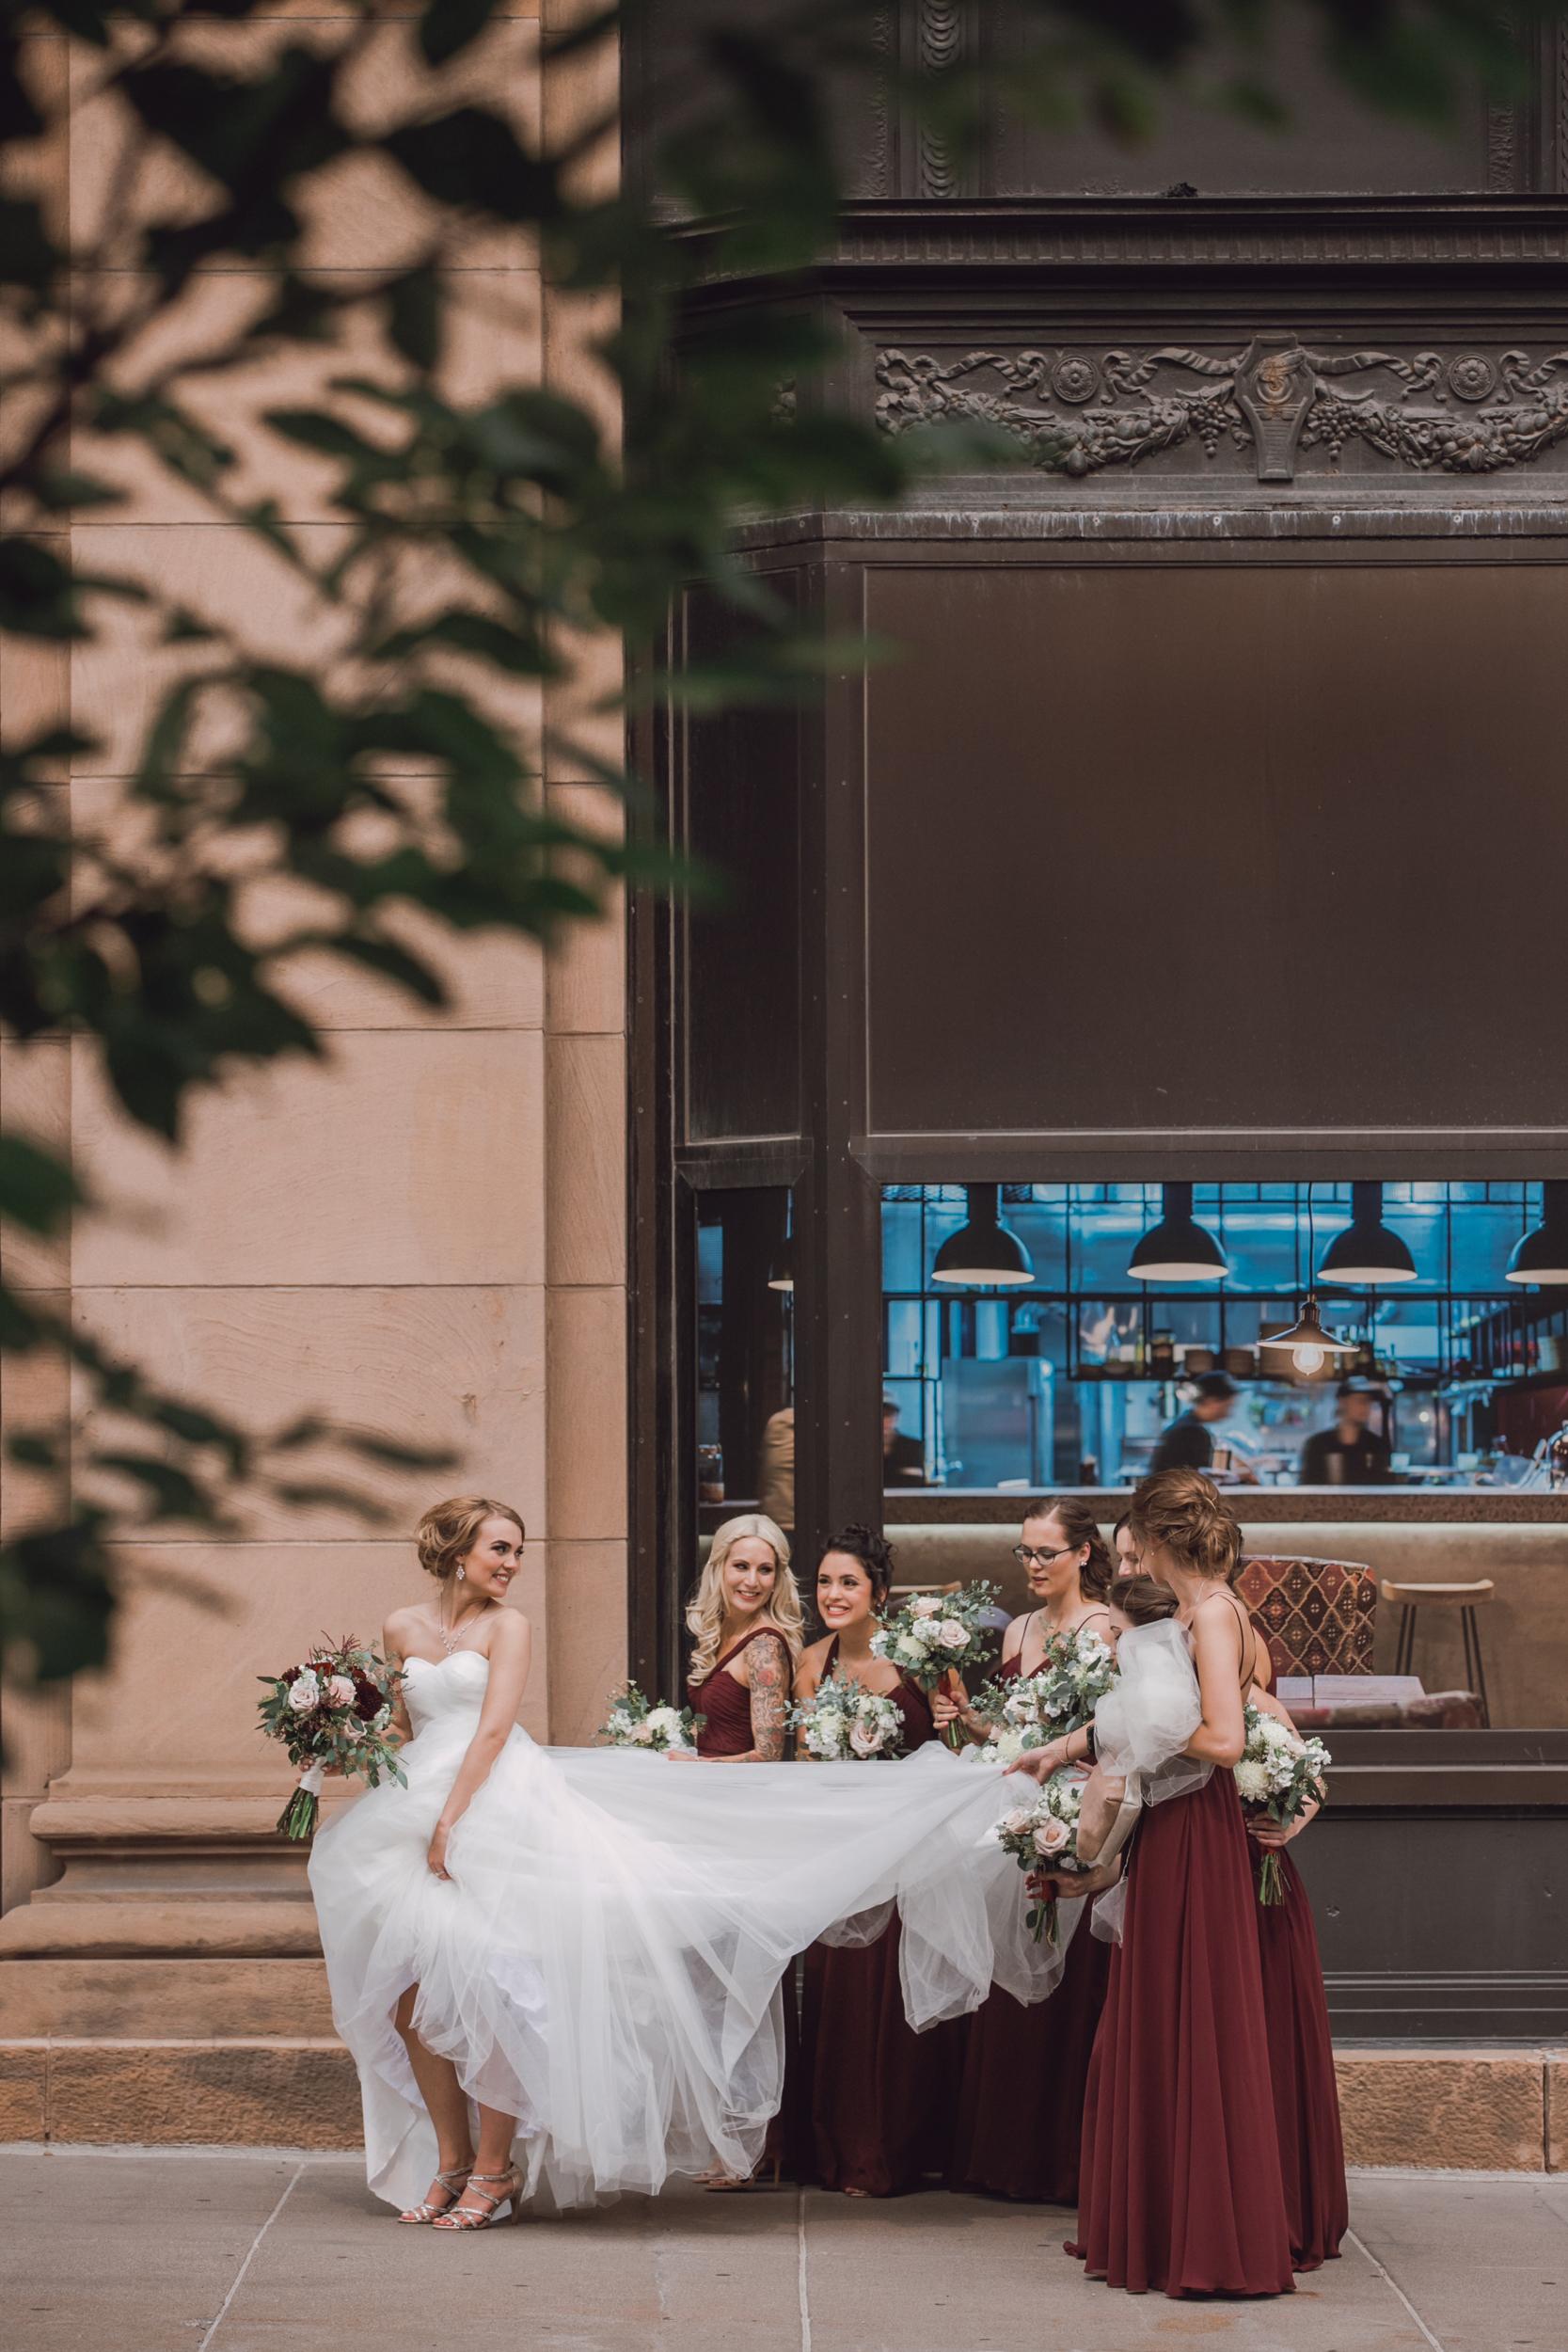 double-tree-hilton-wedding-st-paul-mn-dark-moody-photography-15.jpg